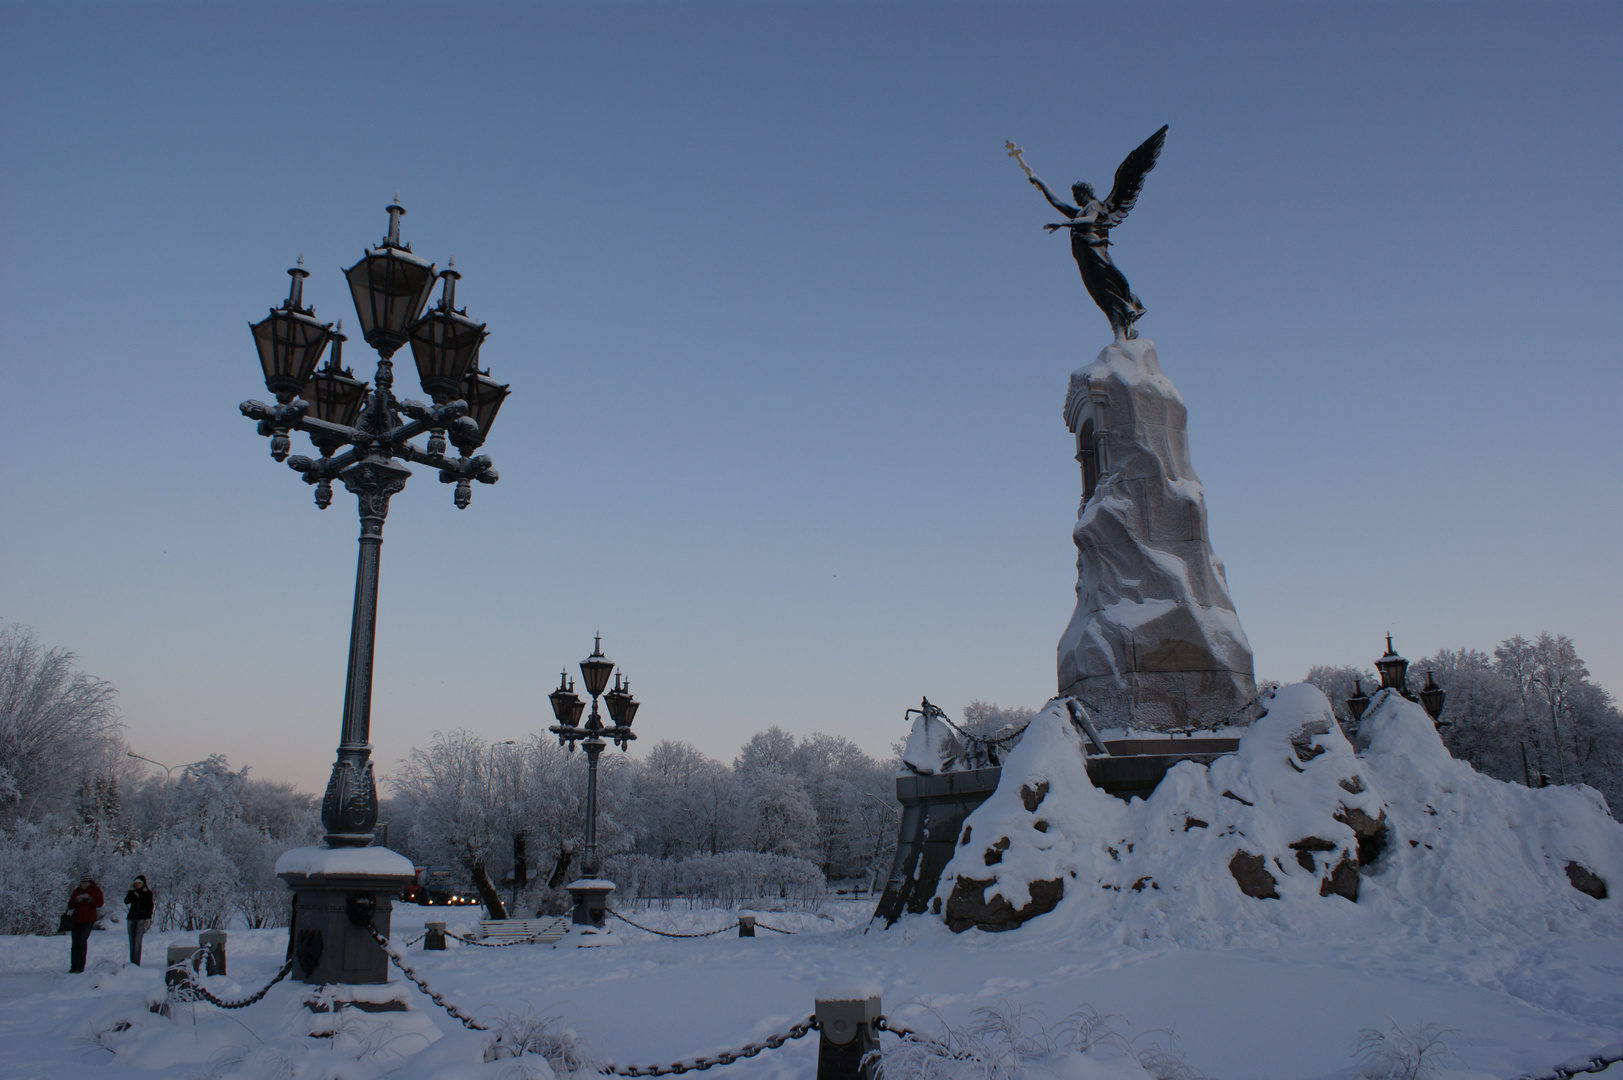 Russalka Tallinn